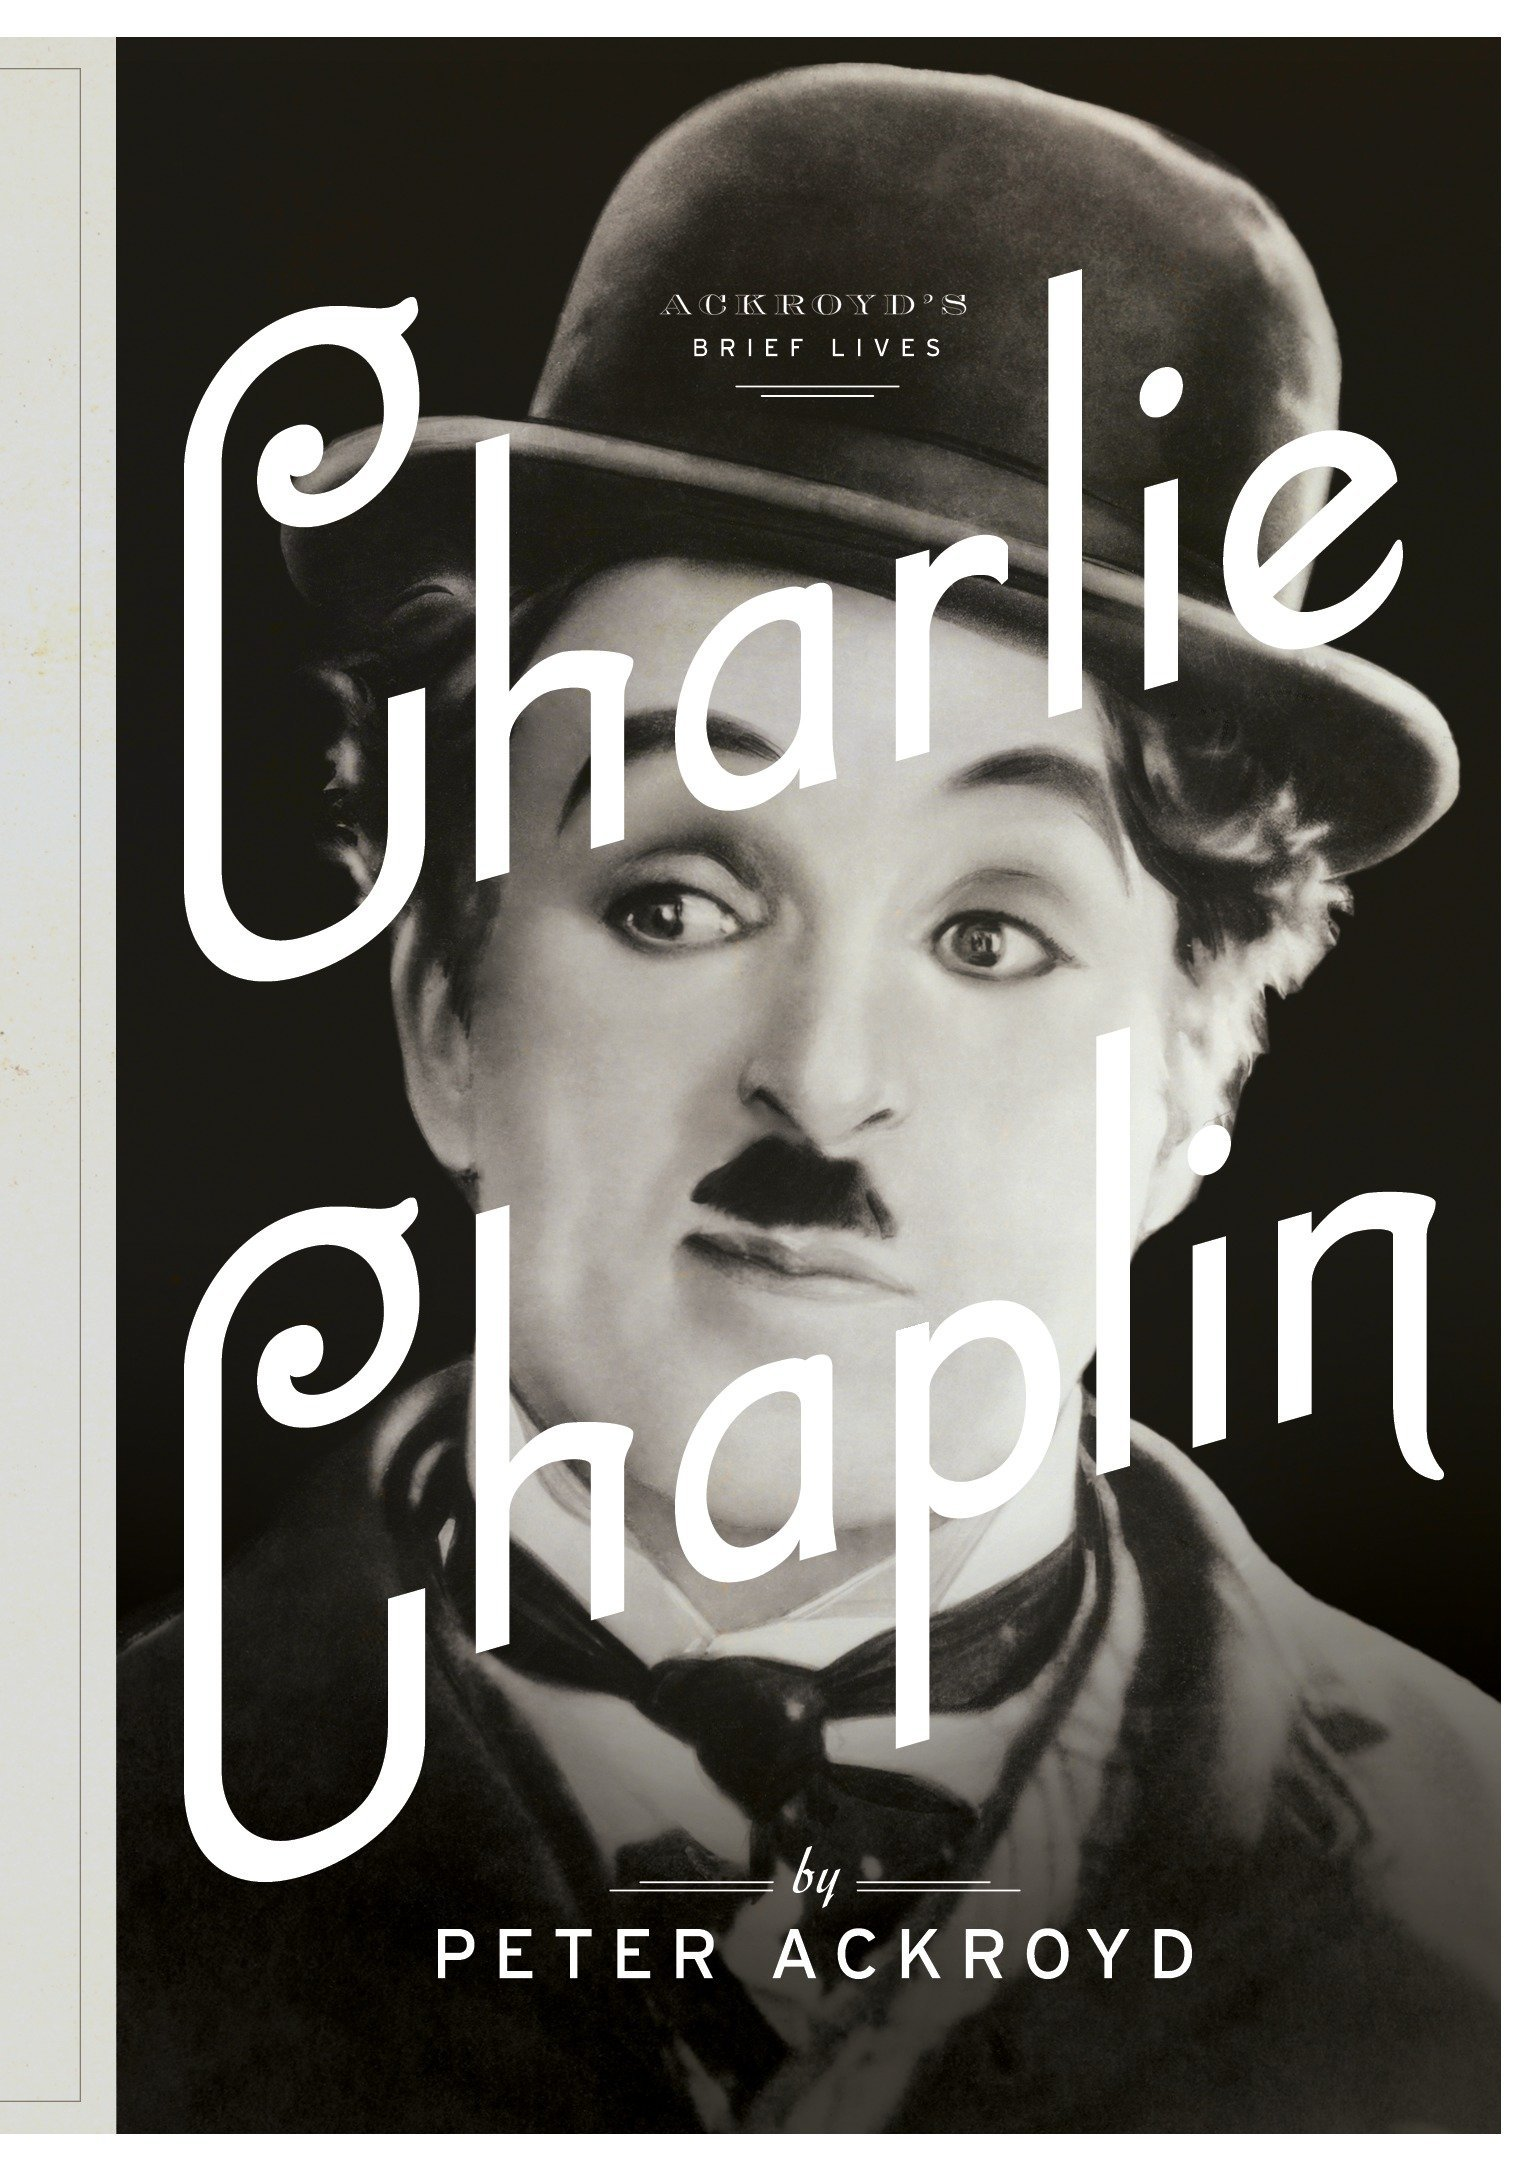 Charlie Chaplin: A Brief Life (Ackroyd's Brief Lives) pdf